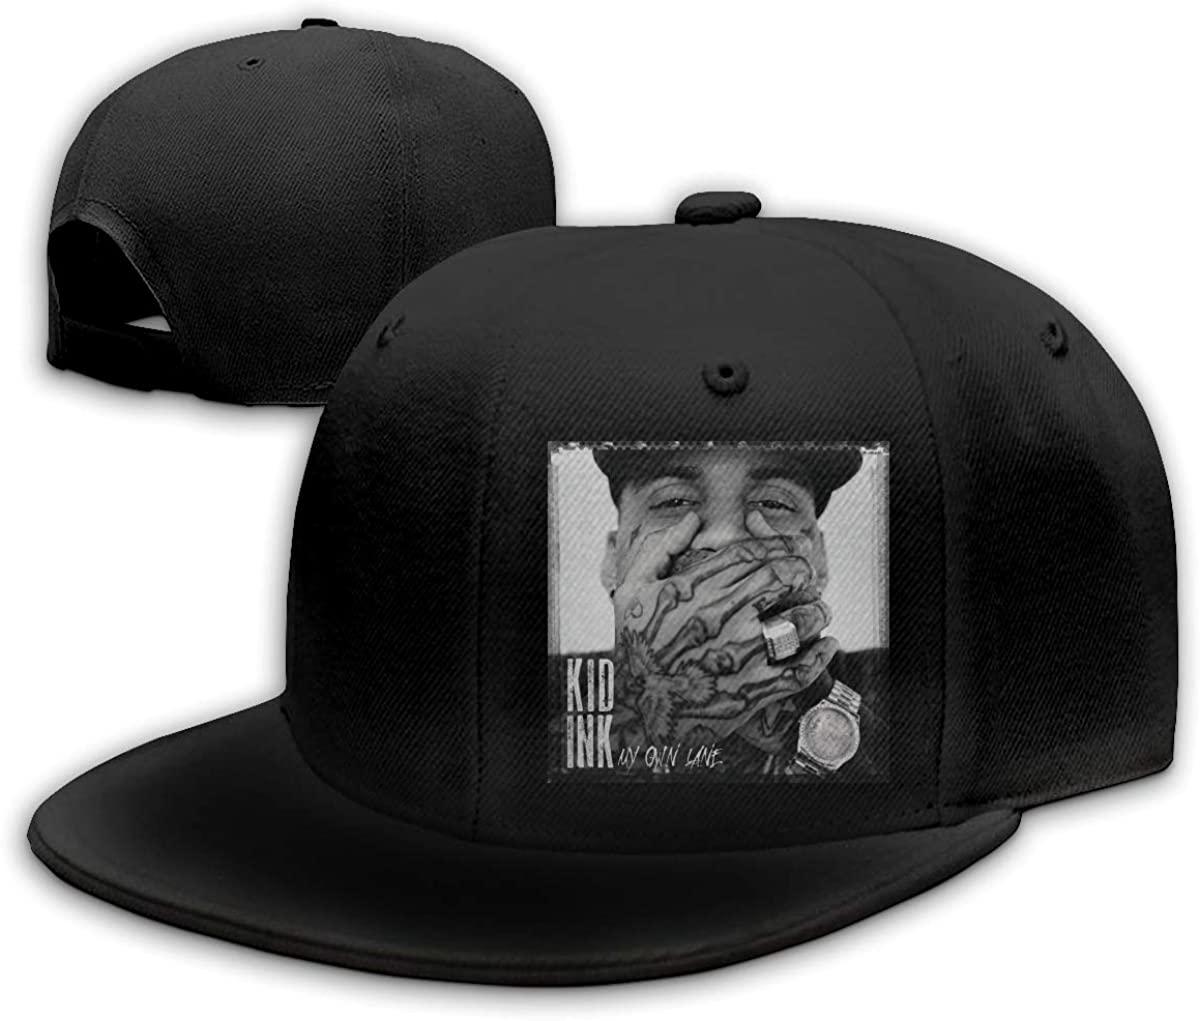 Adjustable Womens Mens Kid Ink My Own Lane Baseball Hat Adult Flat Bill Brim Sun Cap Snapback Hat for Men Women